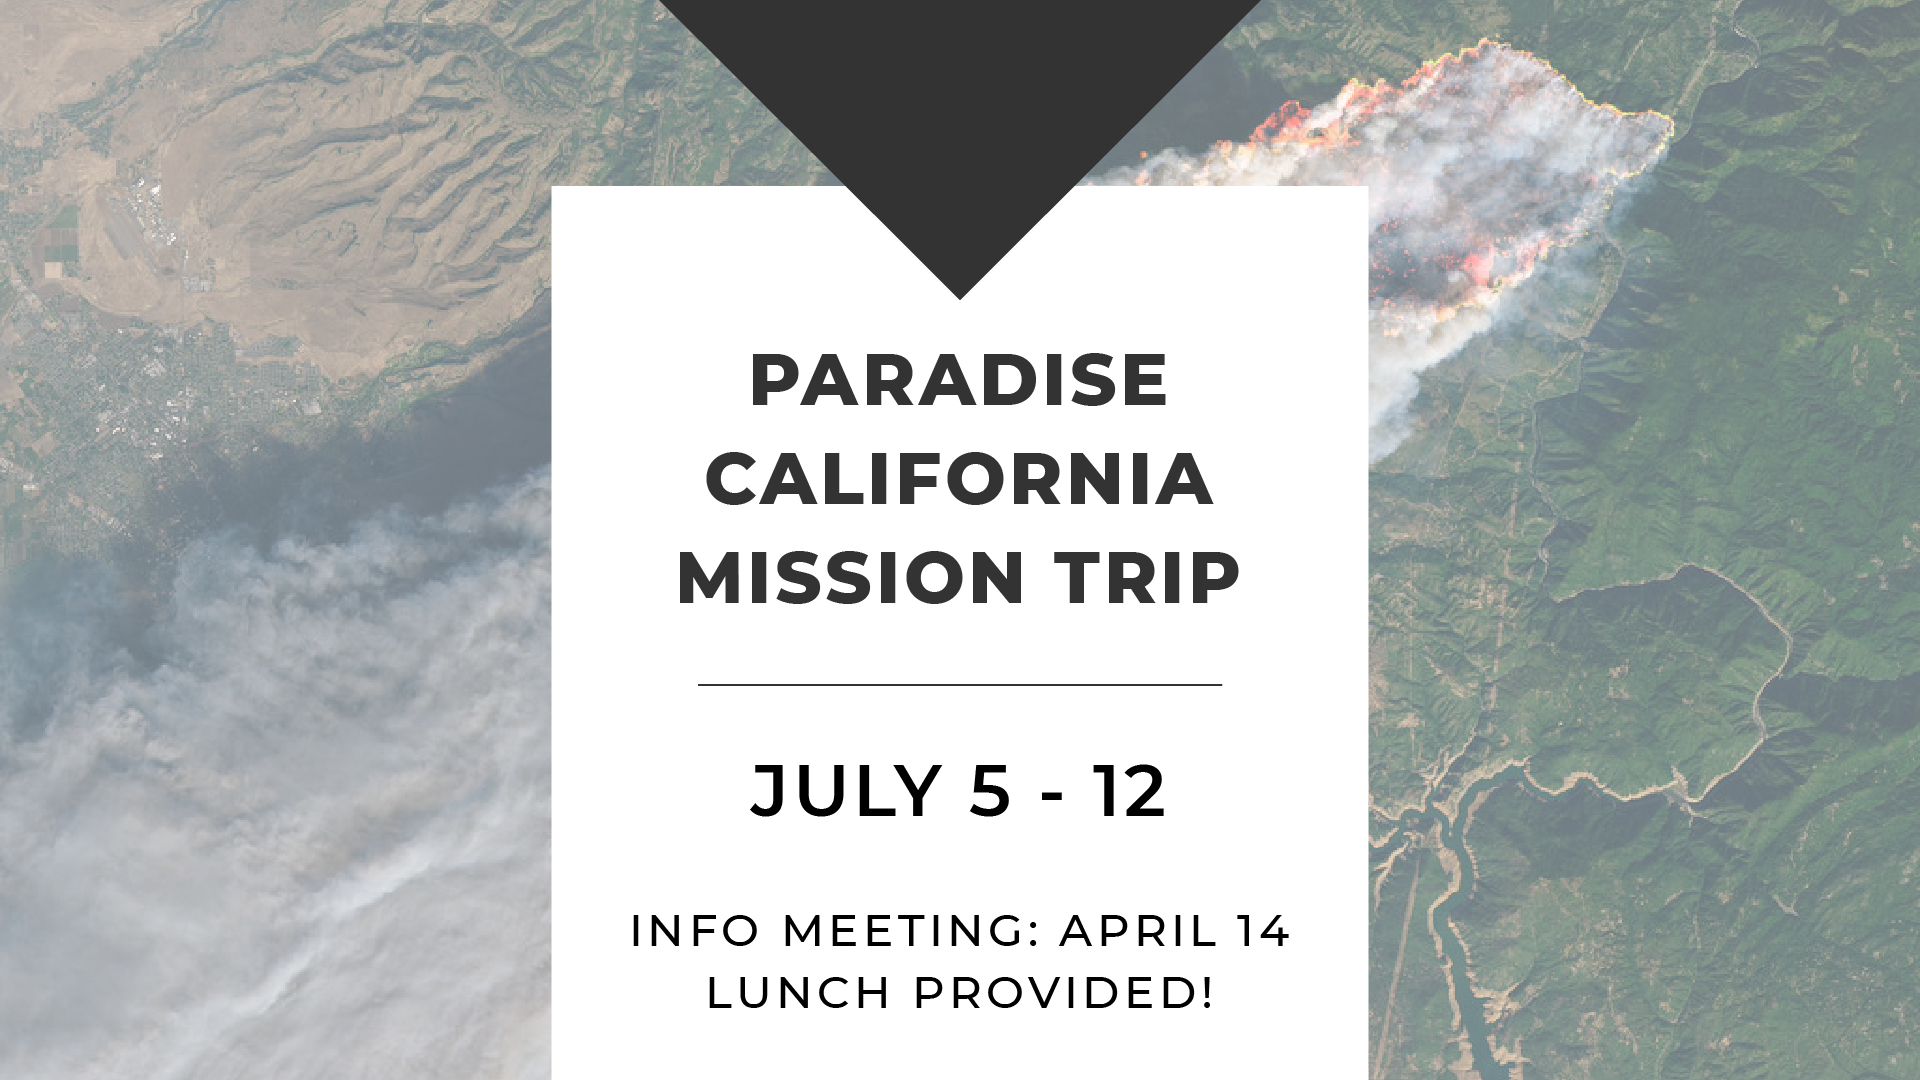 Paradise Mission Trip Slide.jpg